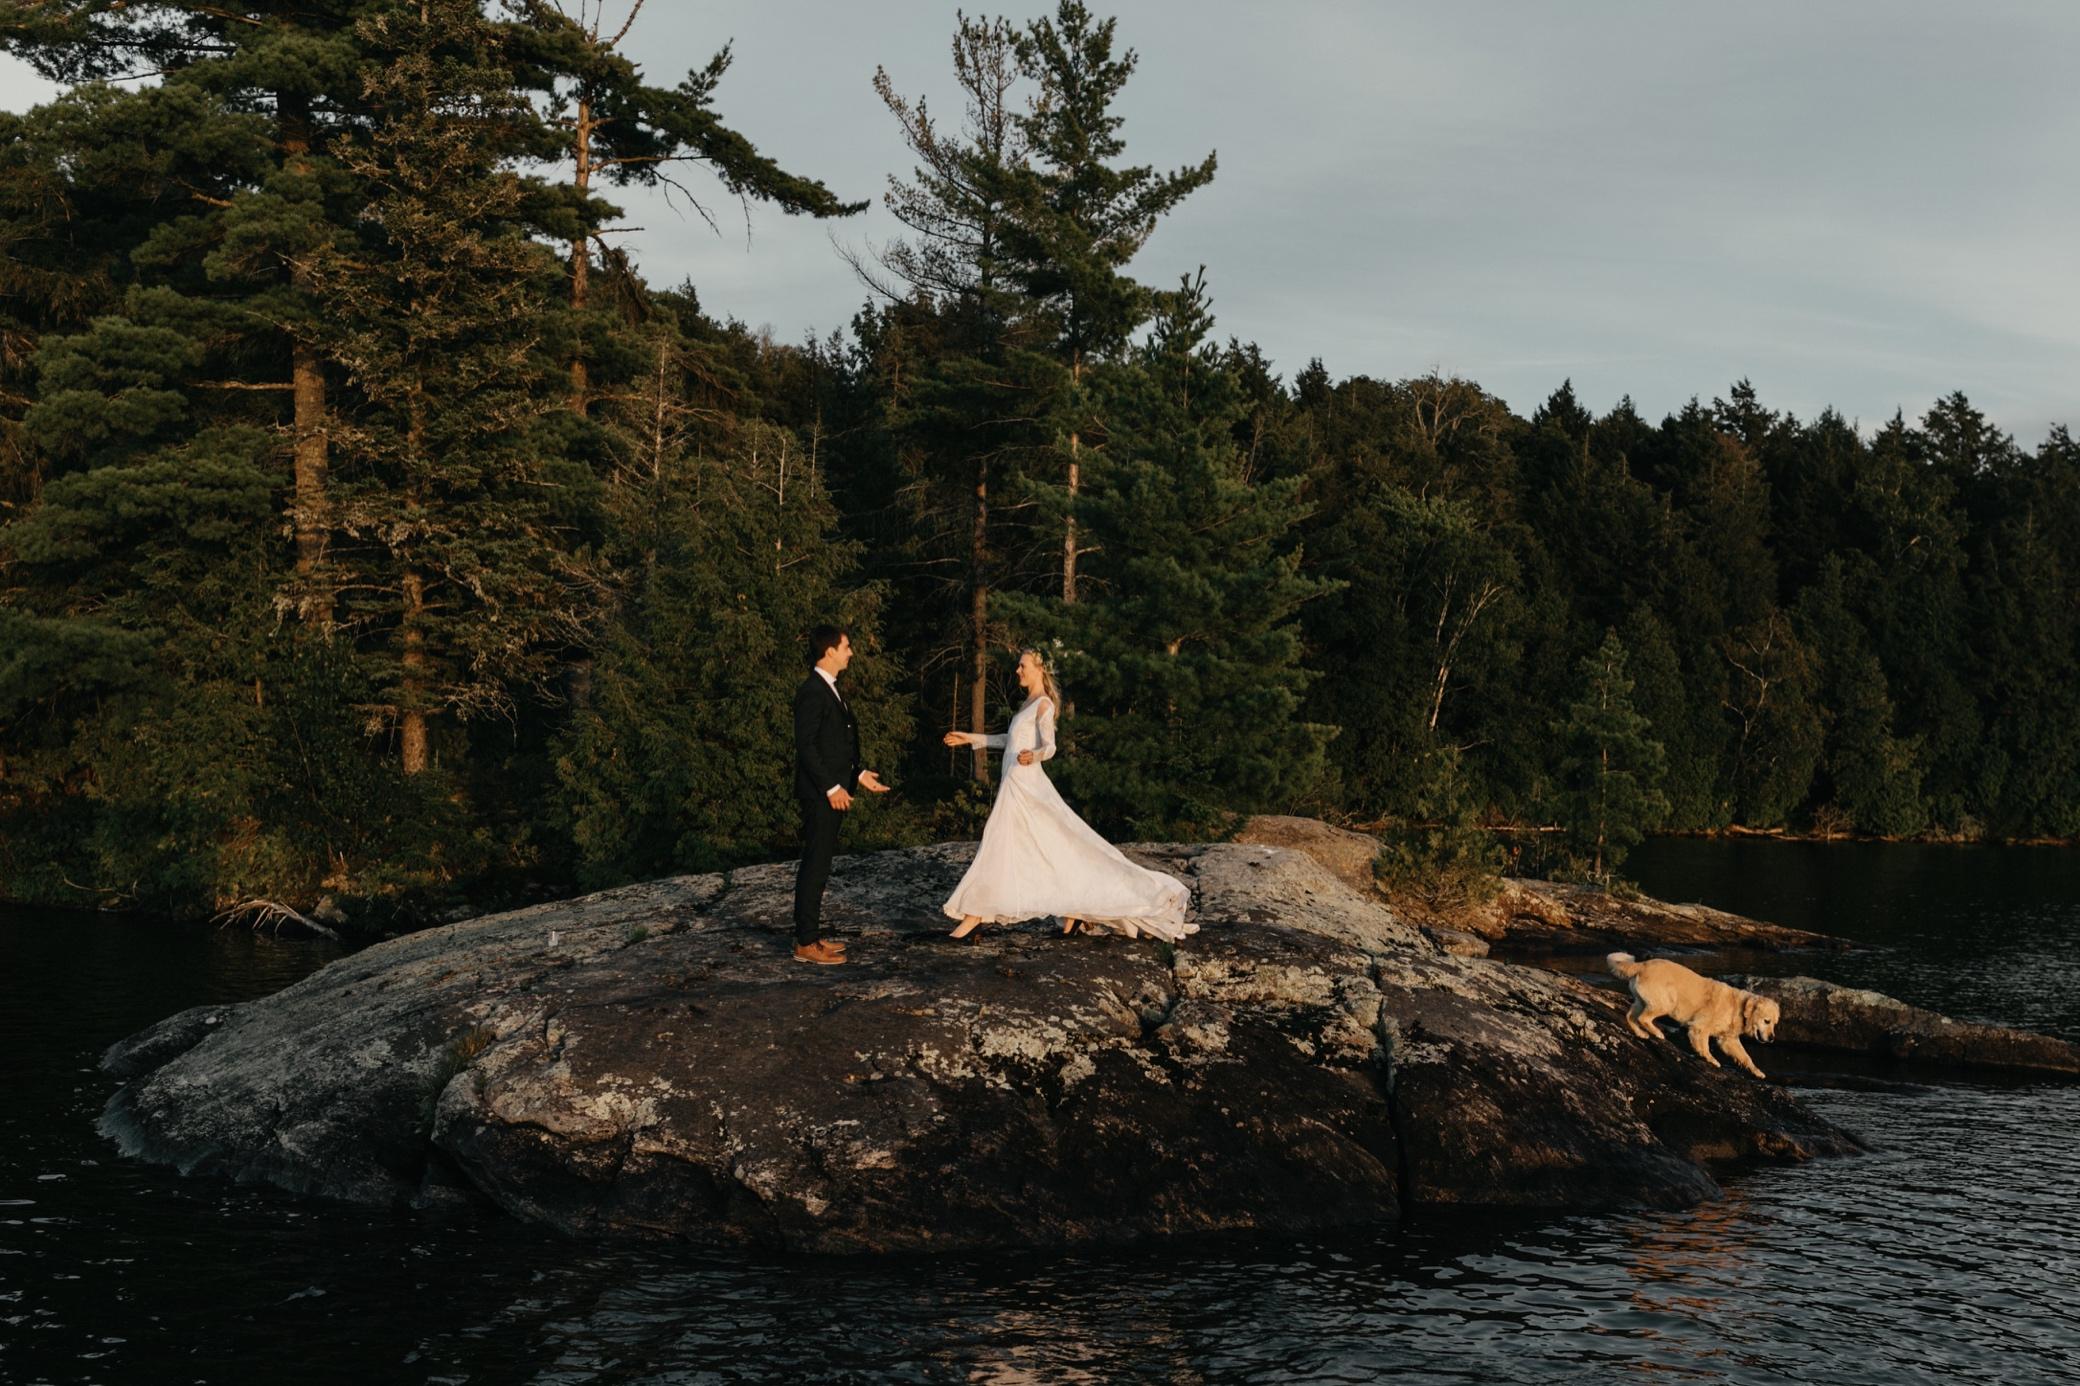 126_Huntsville Wedding  (567 of 689)_Forest_Ontario_Muskoka_Cottage_Huntsville_Algonquin_Wedding.jpg